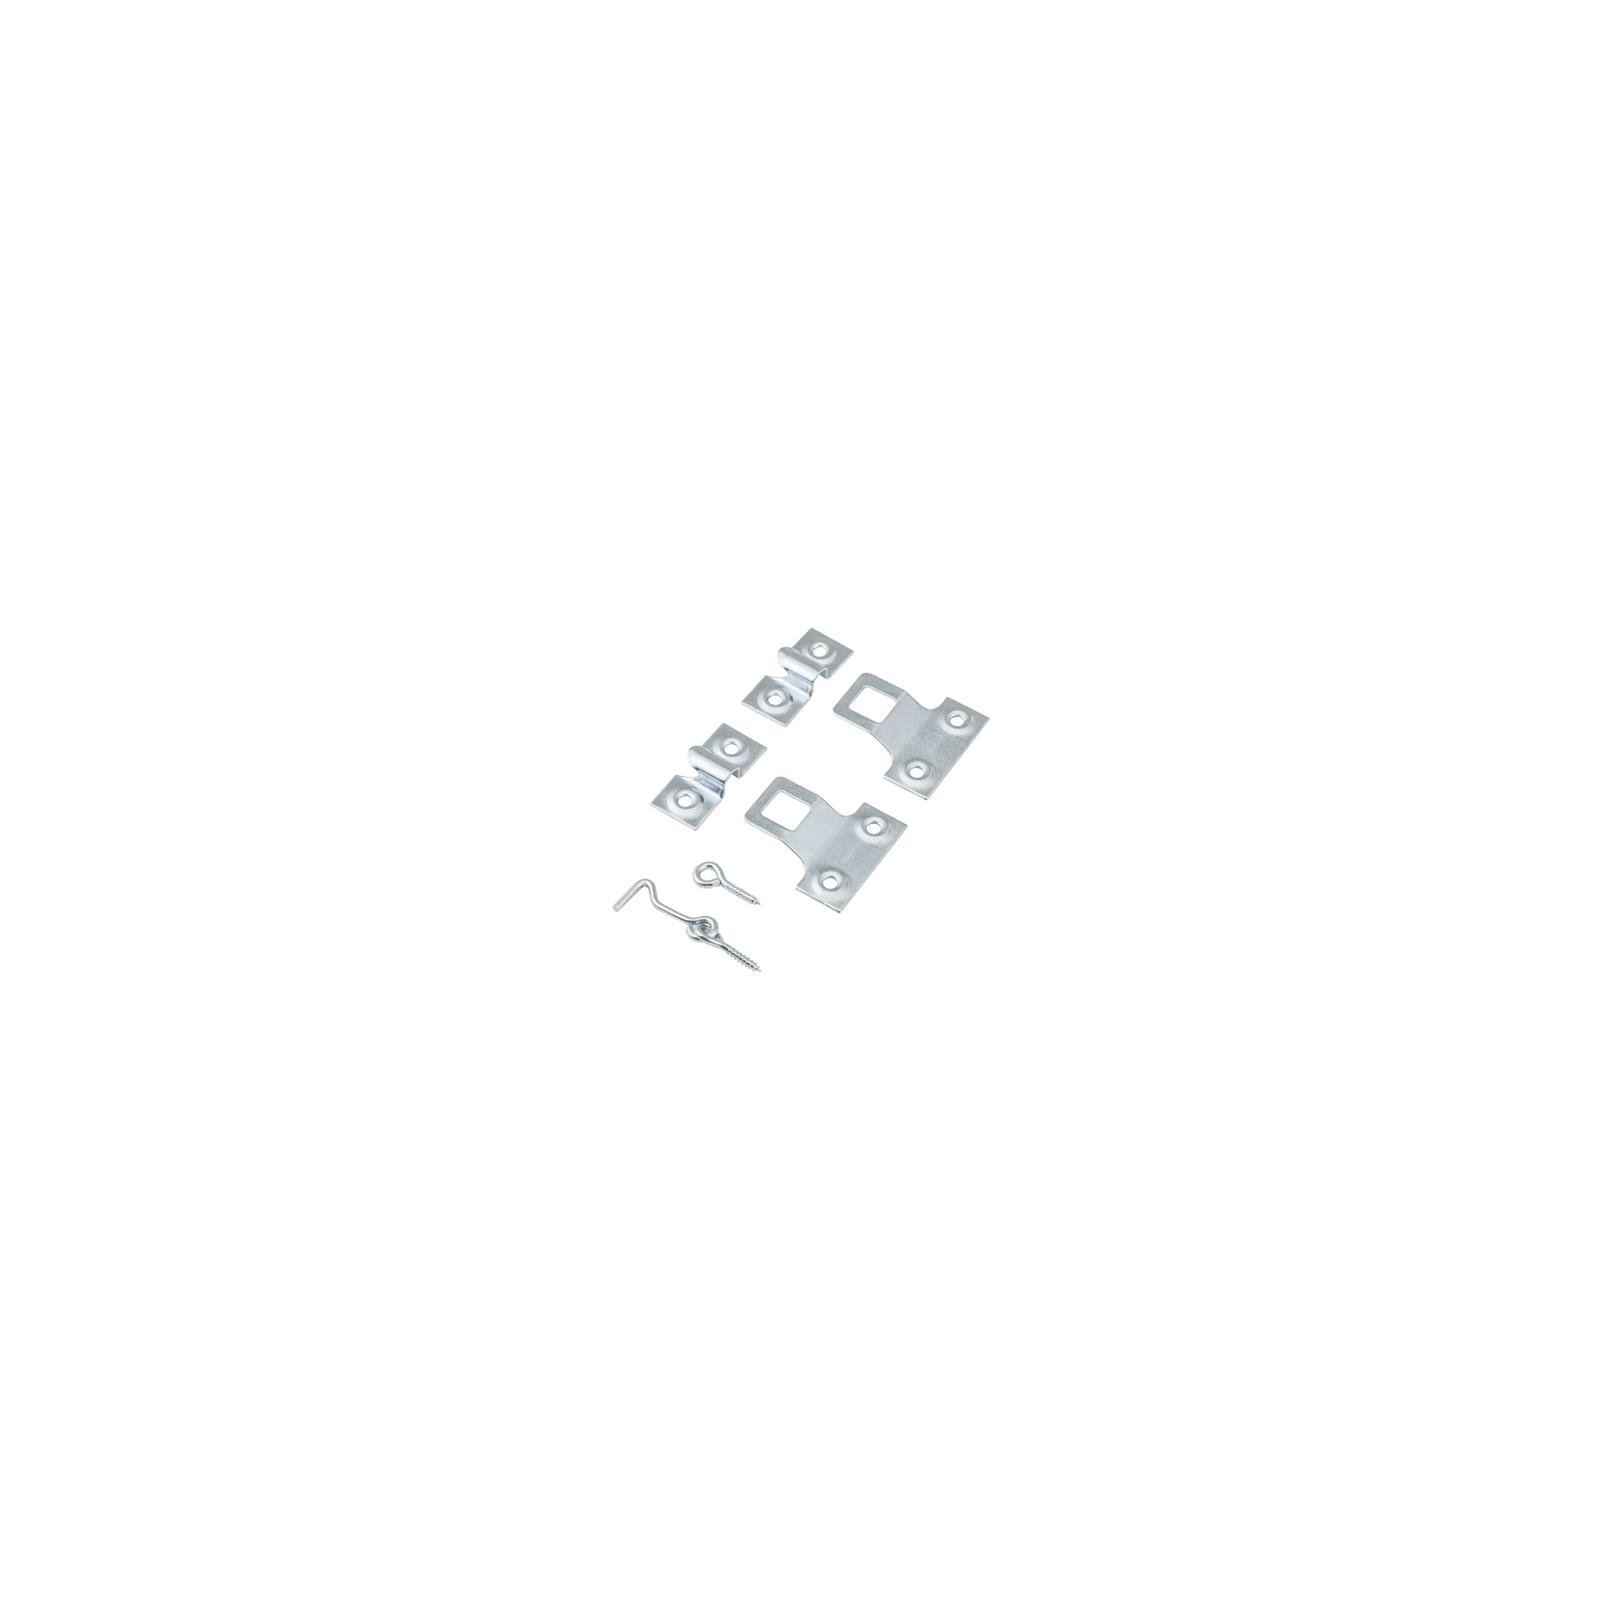 National Mfg/Spectrum Brands Hhi N109-171 Zinc Wind or Window Sash Hanger - Quantity 5